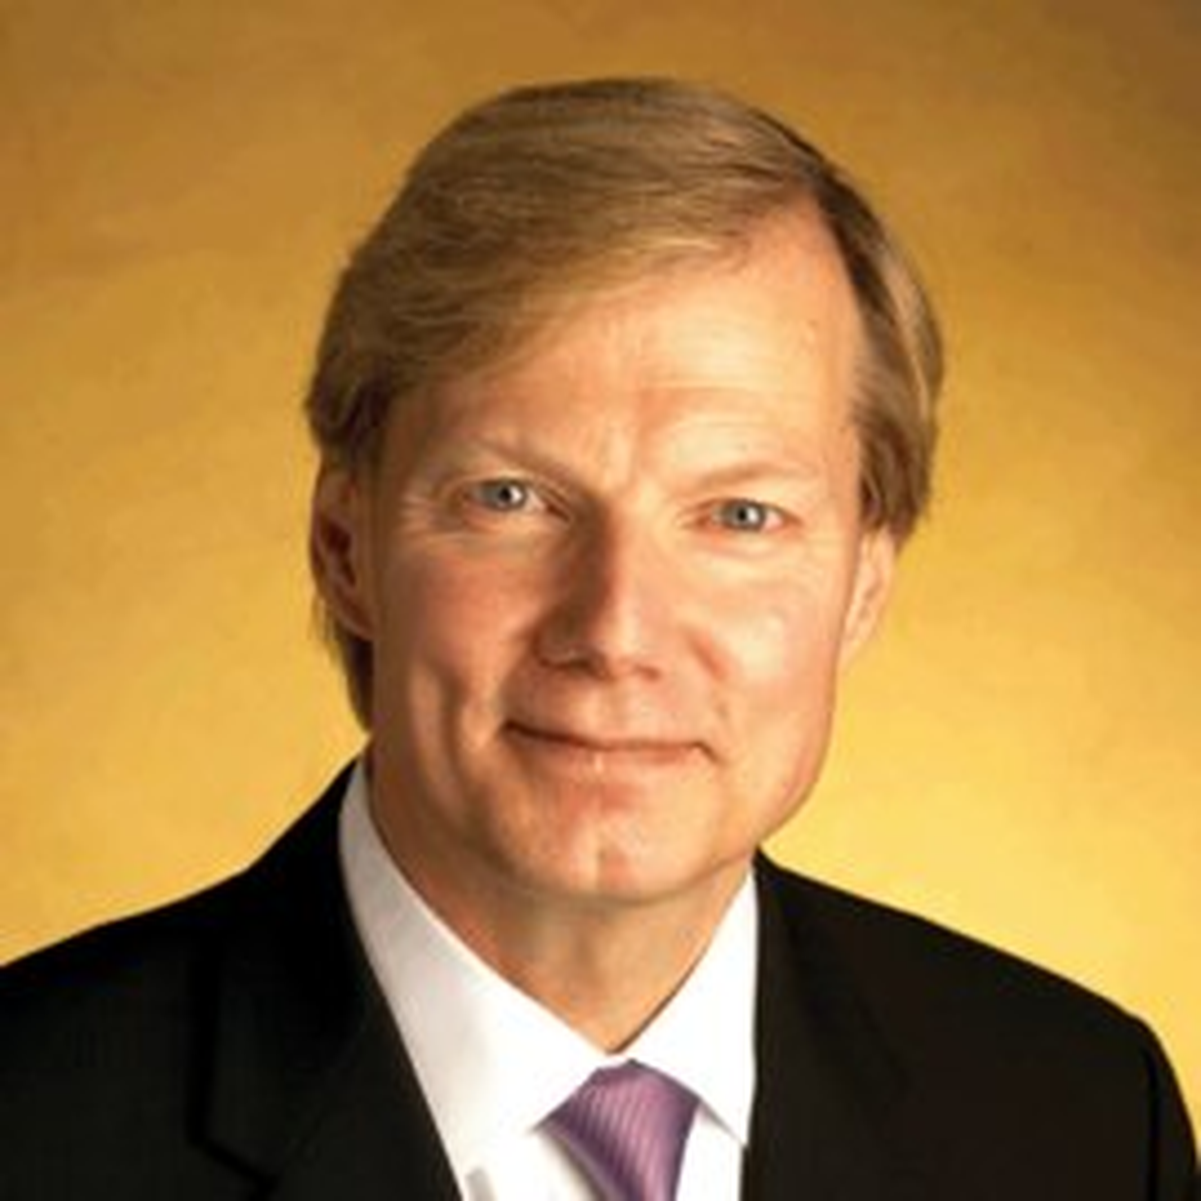 Tim Porter-O'Grady